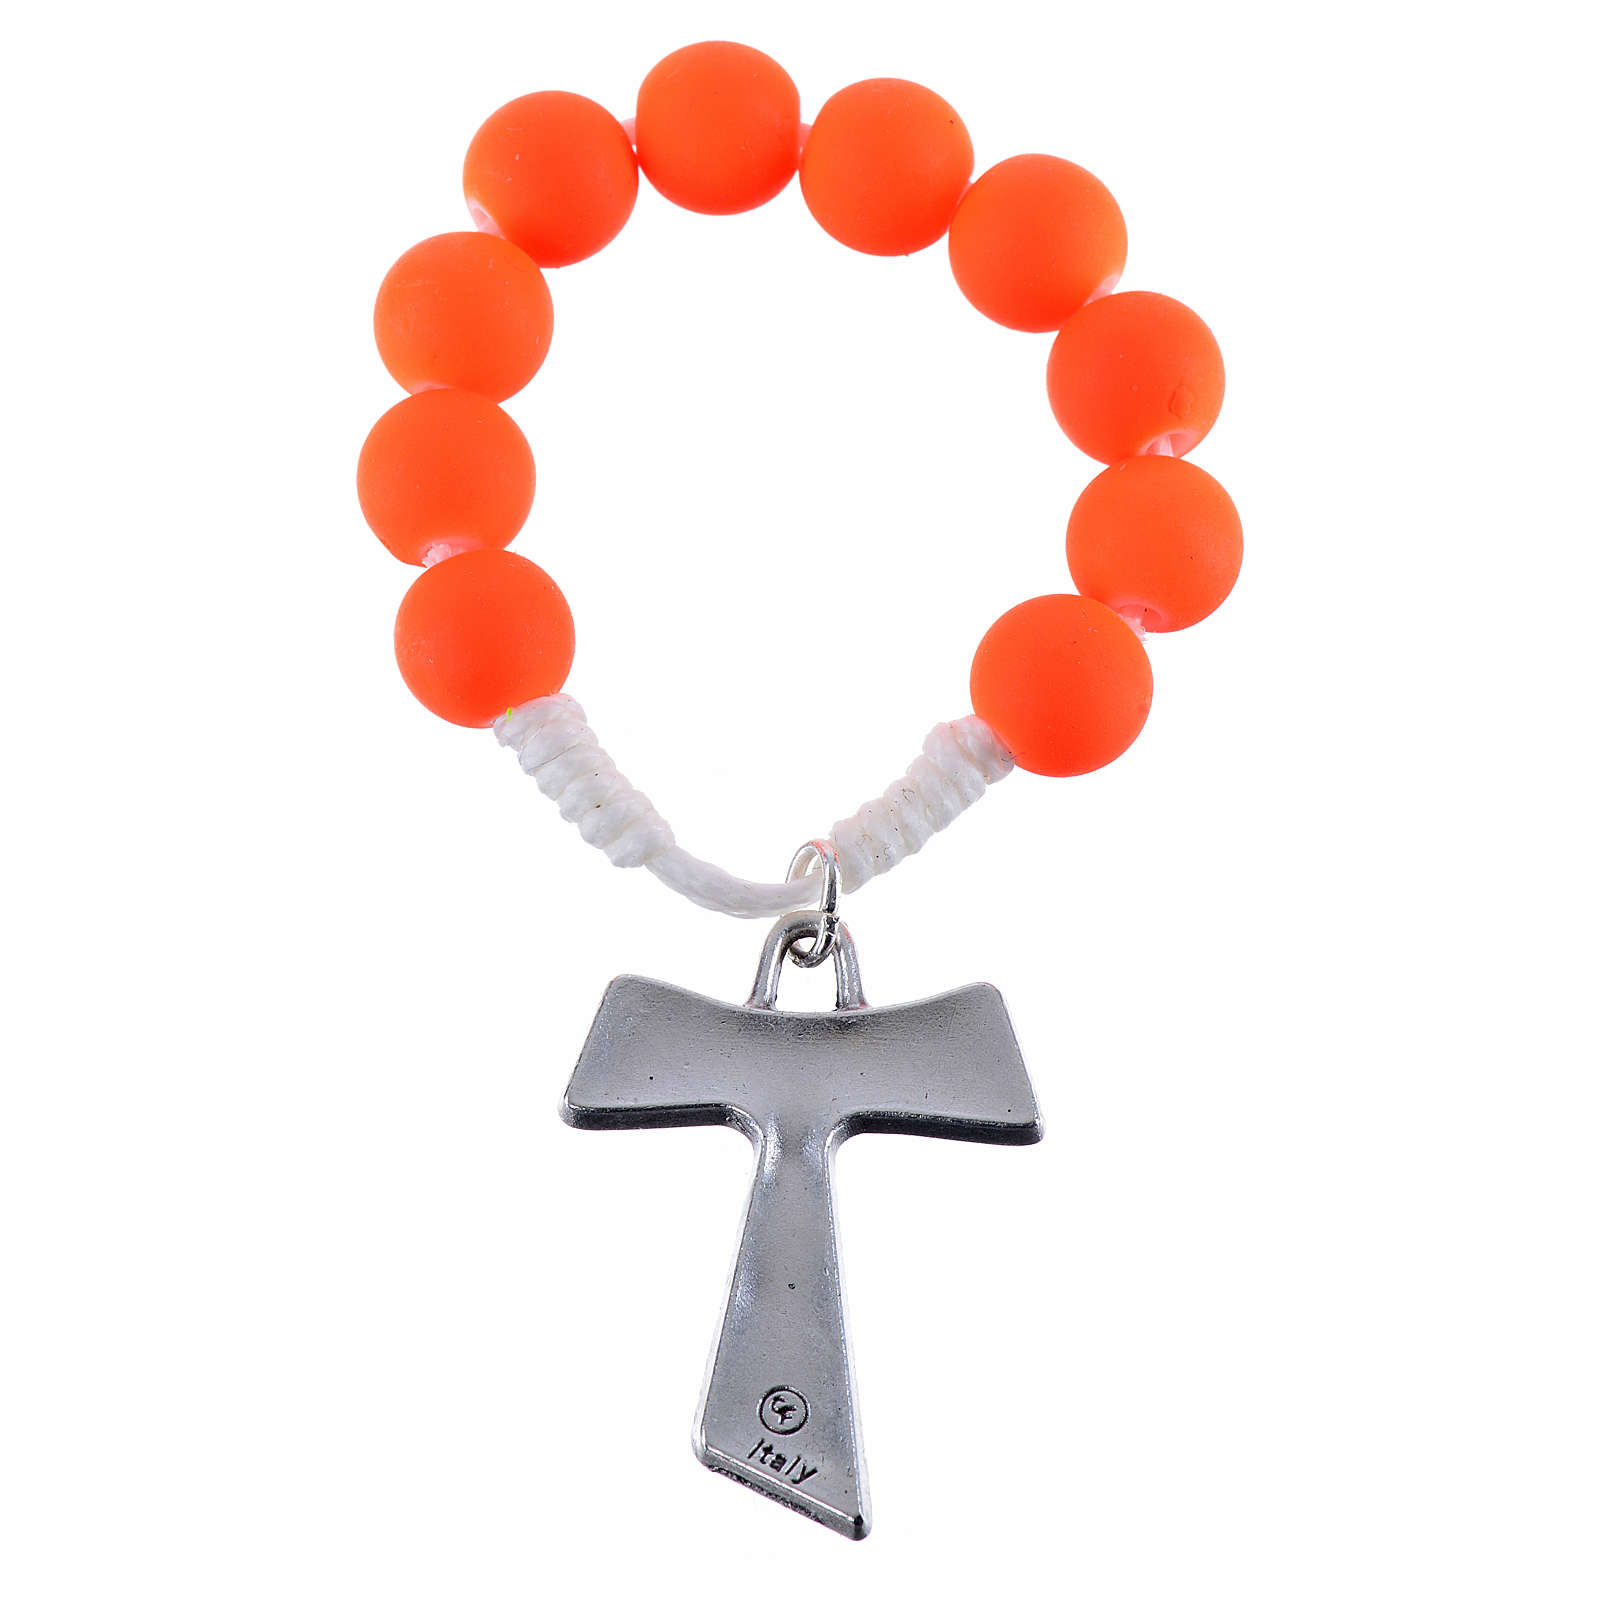 Single decade rosary beads in orange fimo, with Tau 4